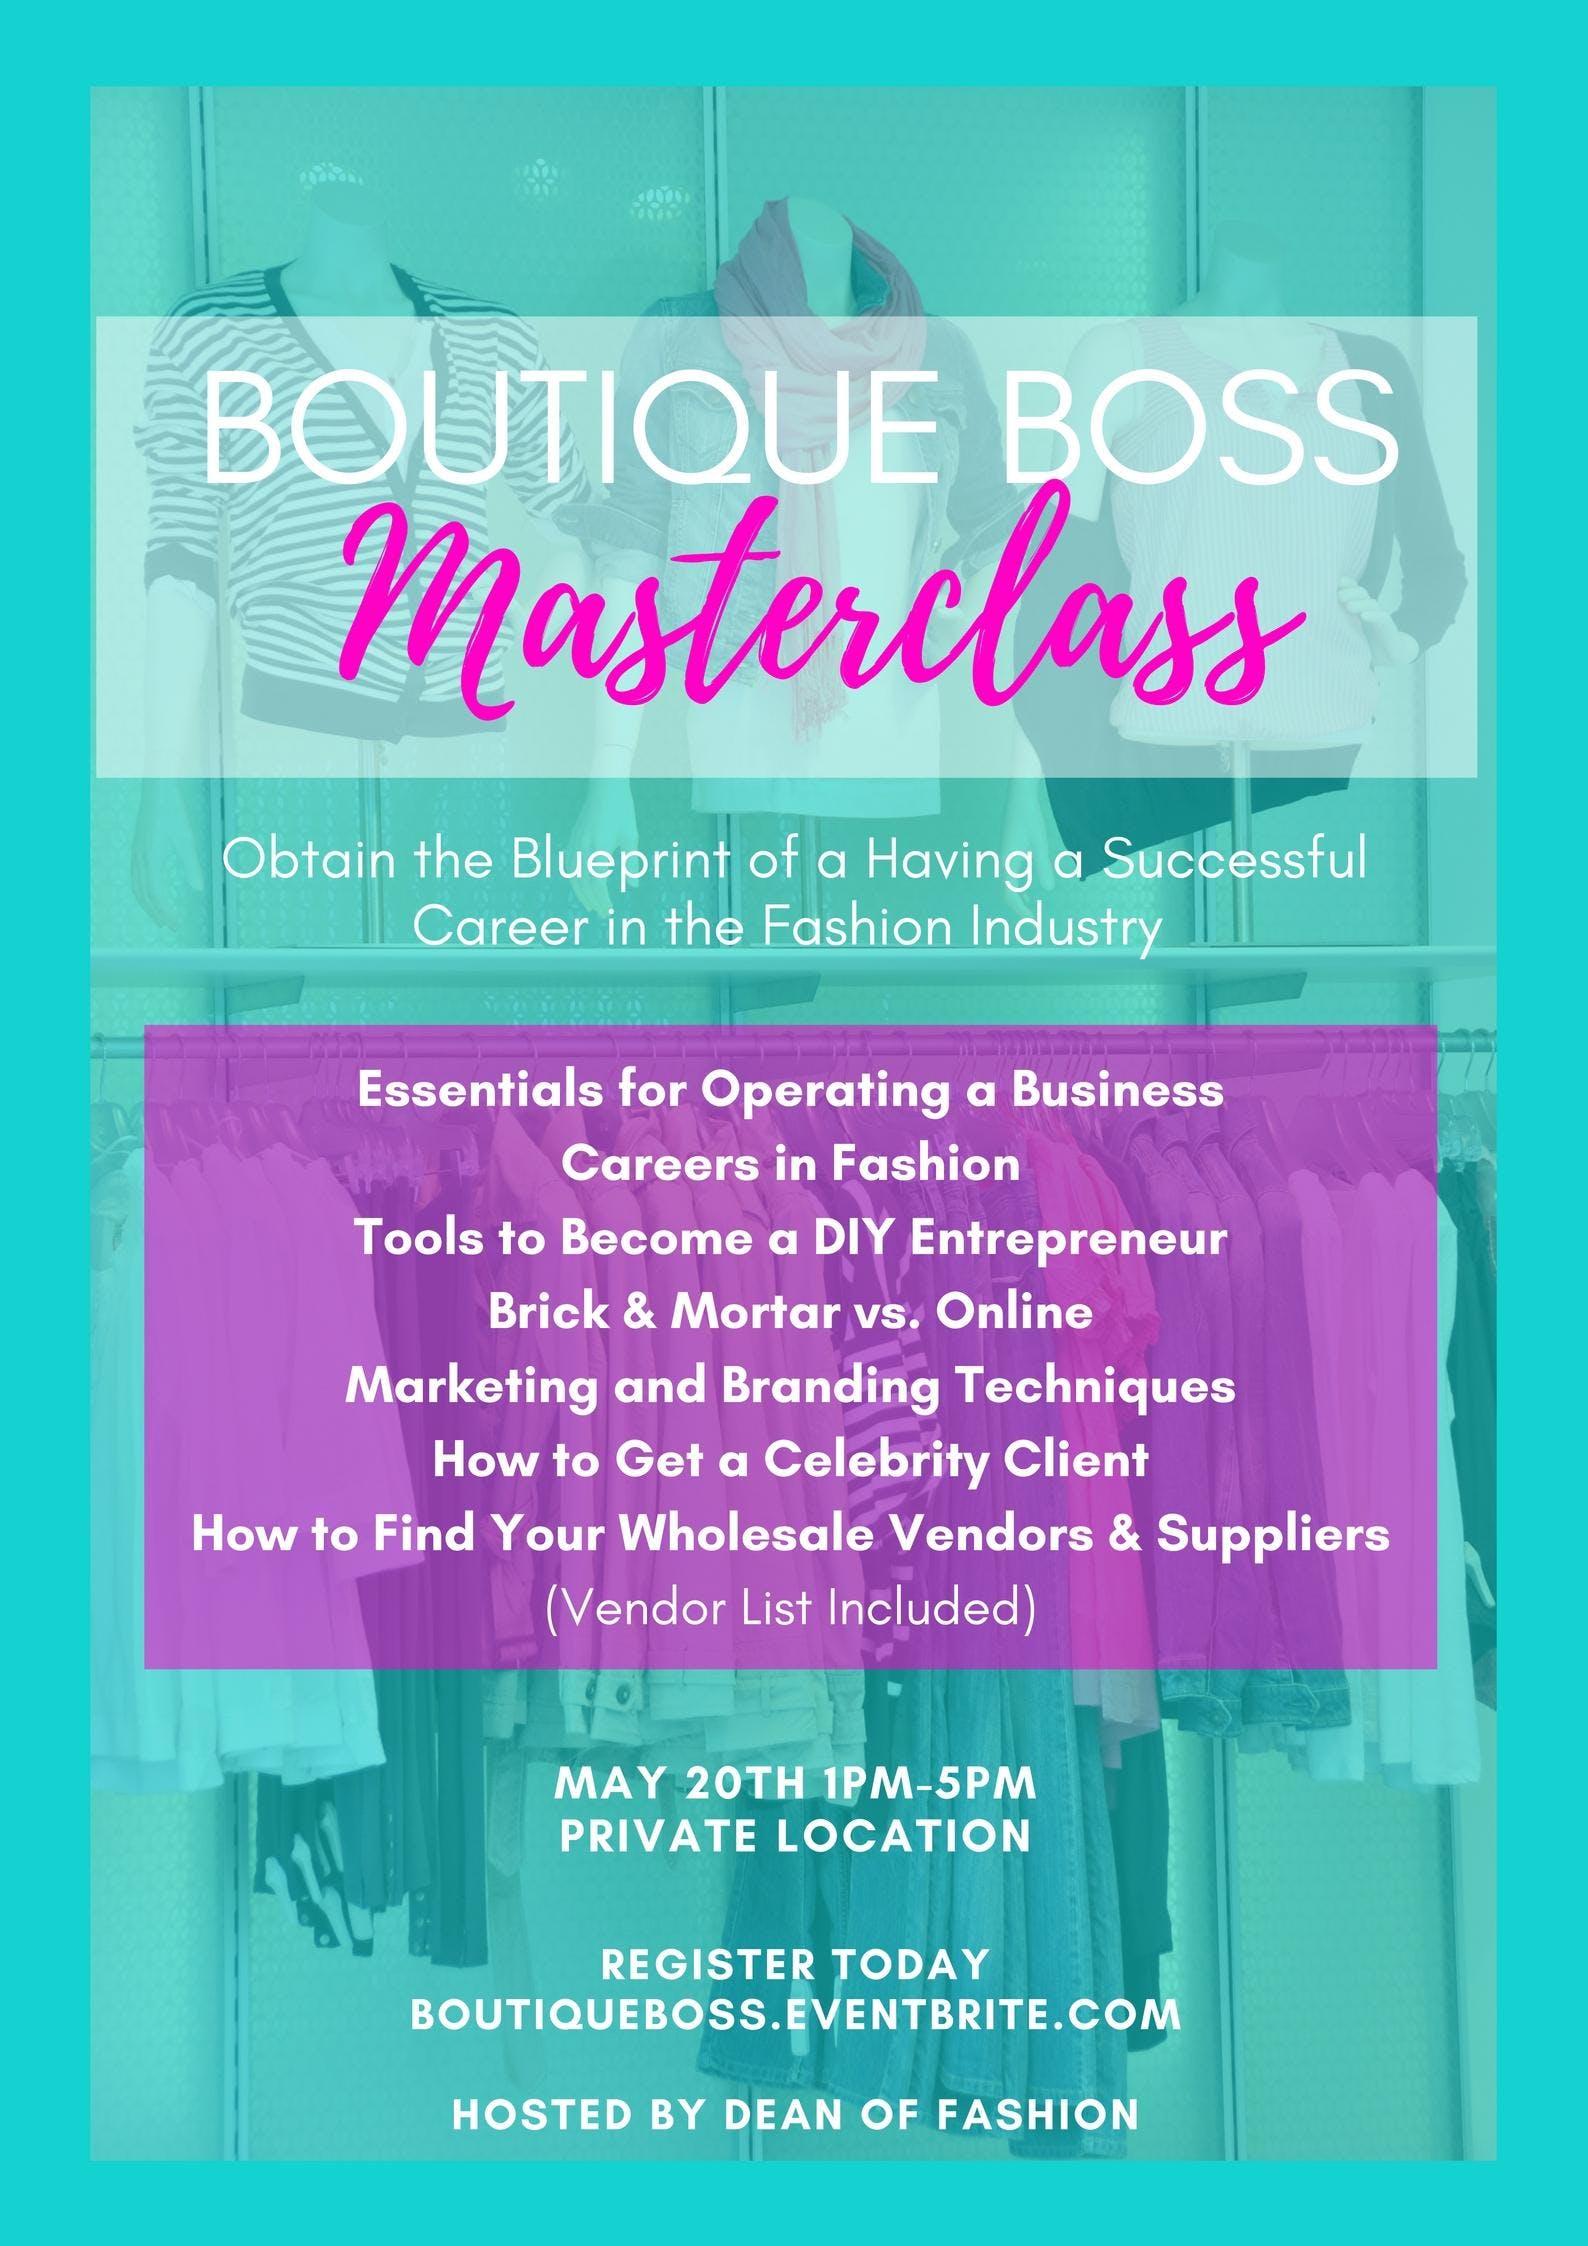 Boutique boss masterclass at tba memphis boutique boss masterclass malvernweather Choice Image